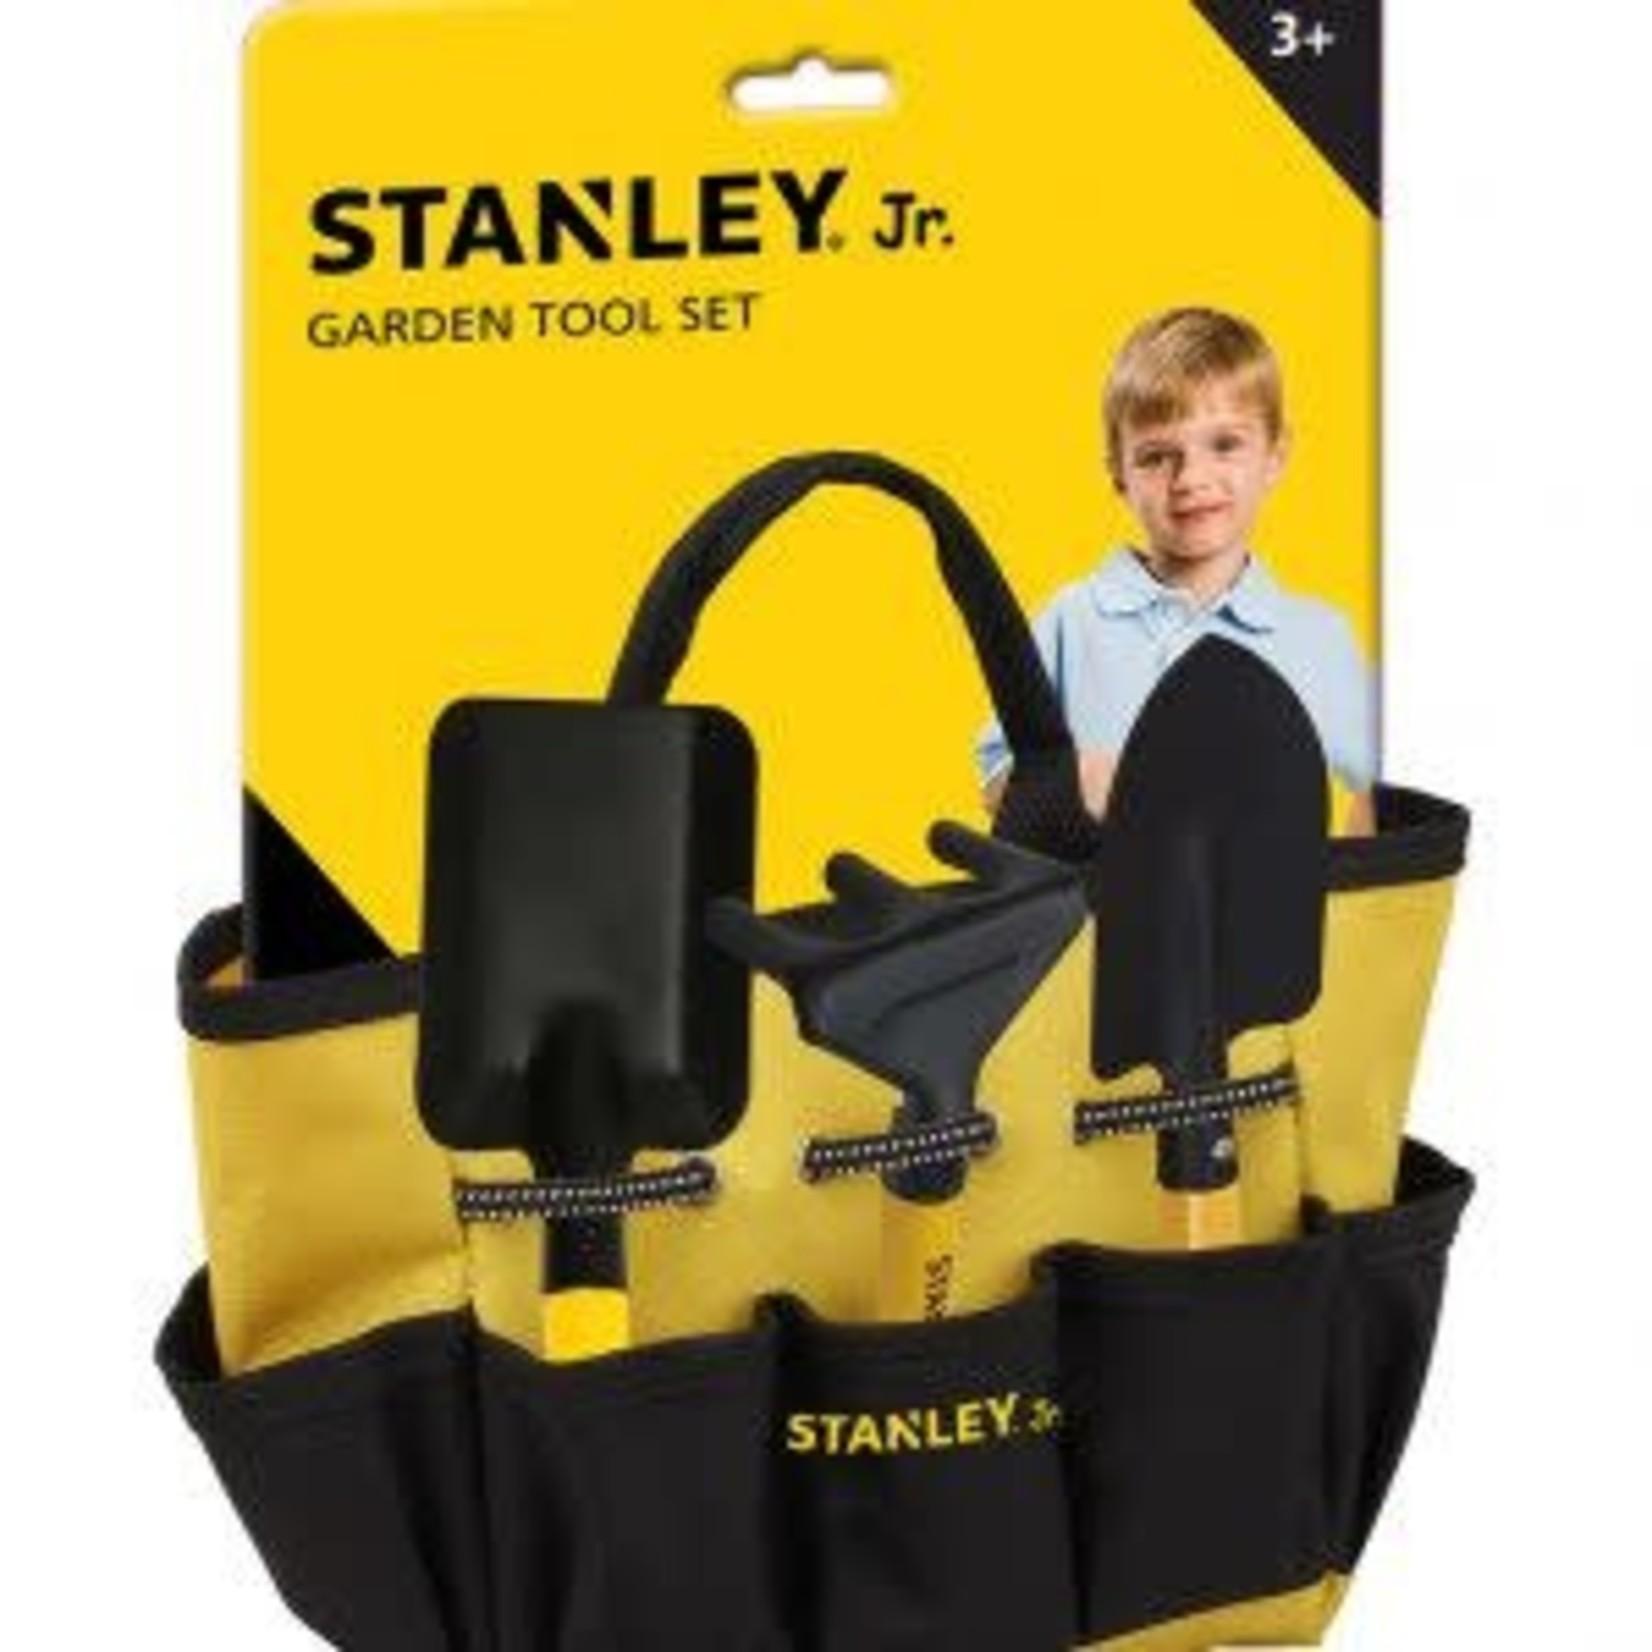 Stanley Jr. Ensemble de Jardinage 4 pcs